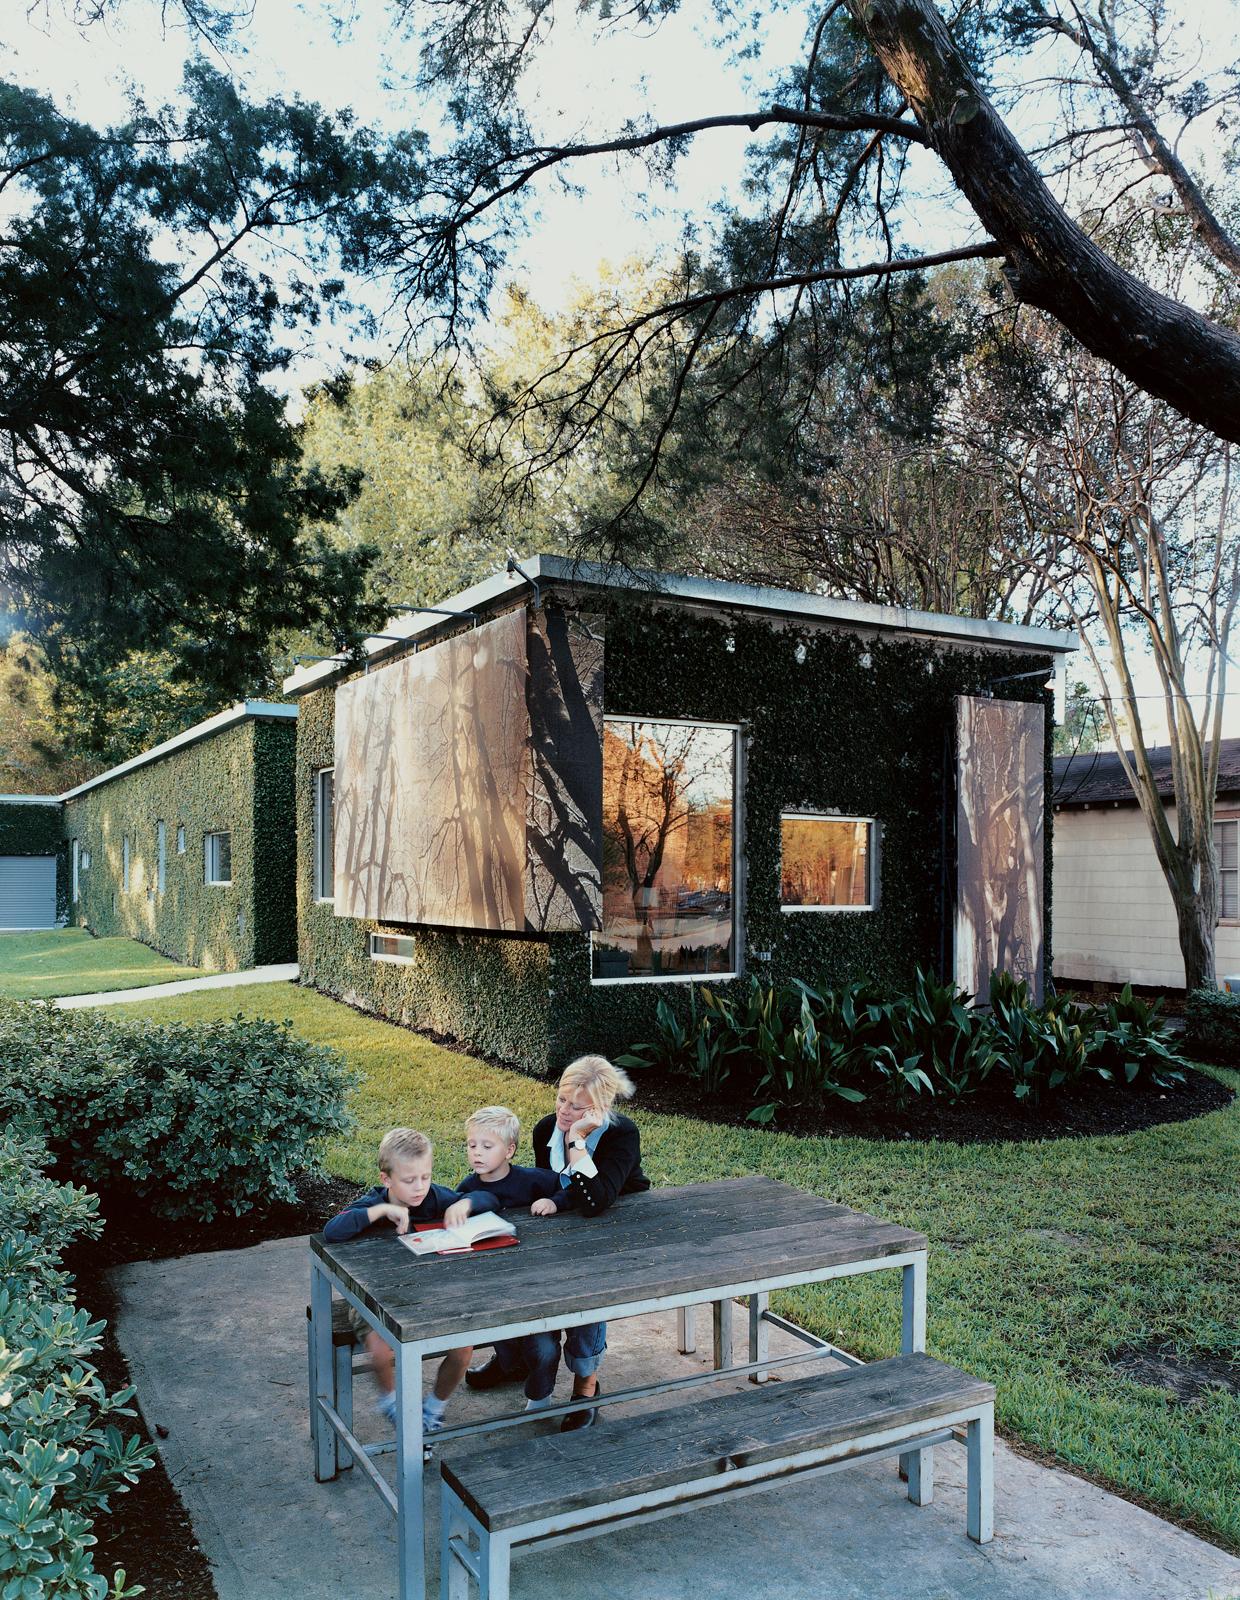 Backyard picnic table in Baton Rouge, Louisiana